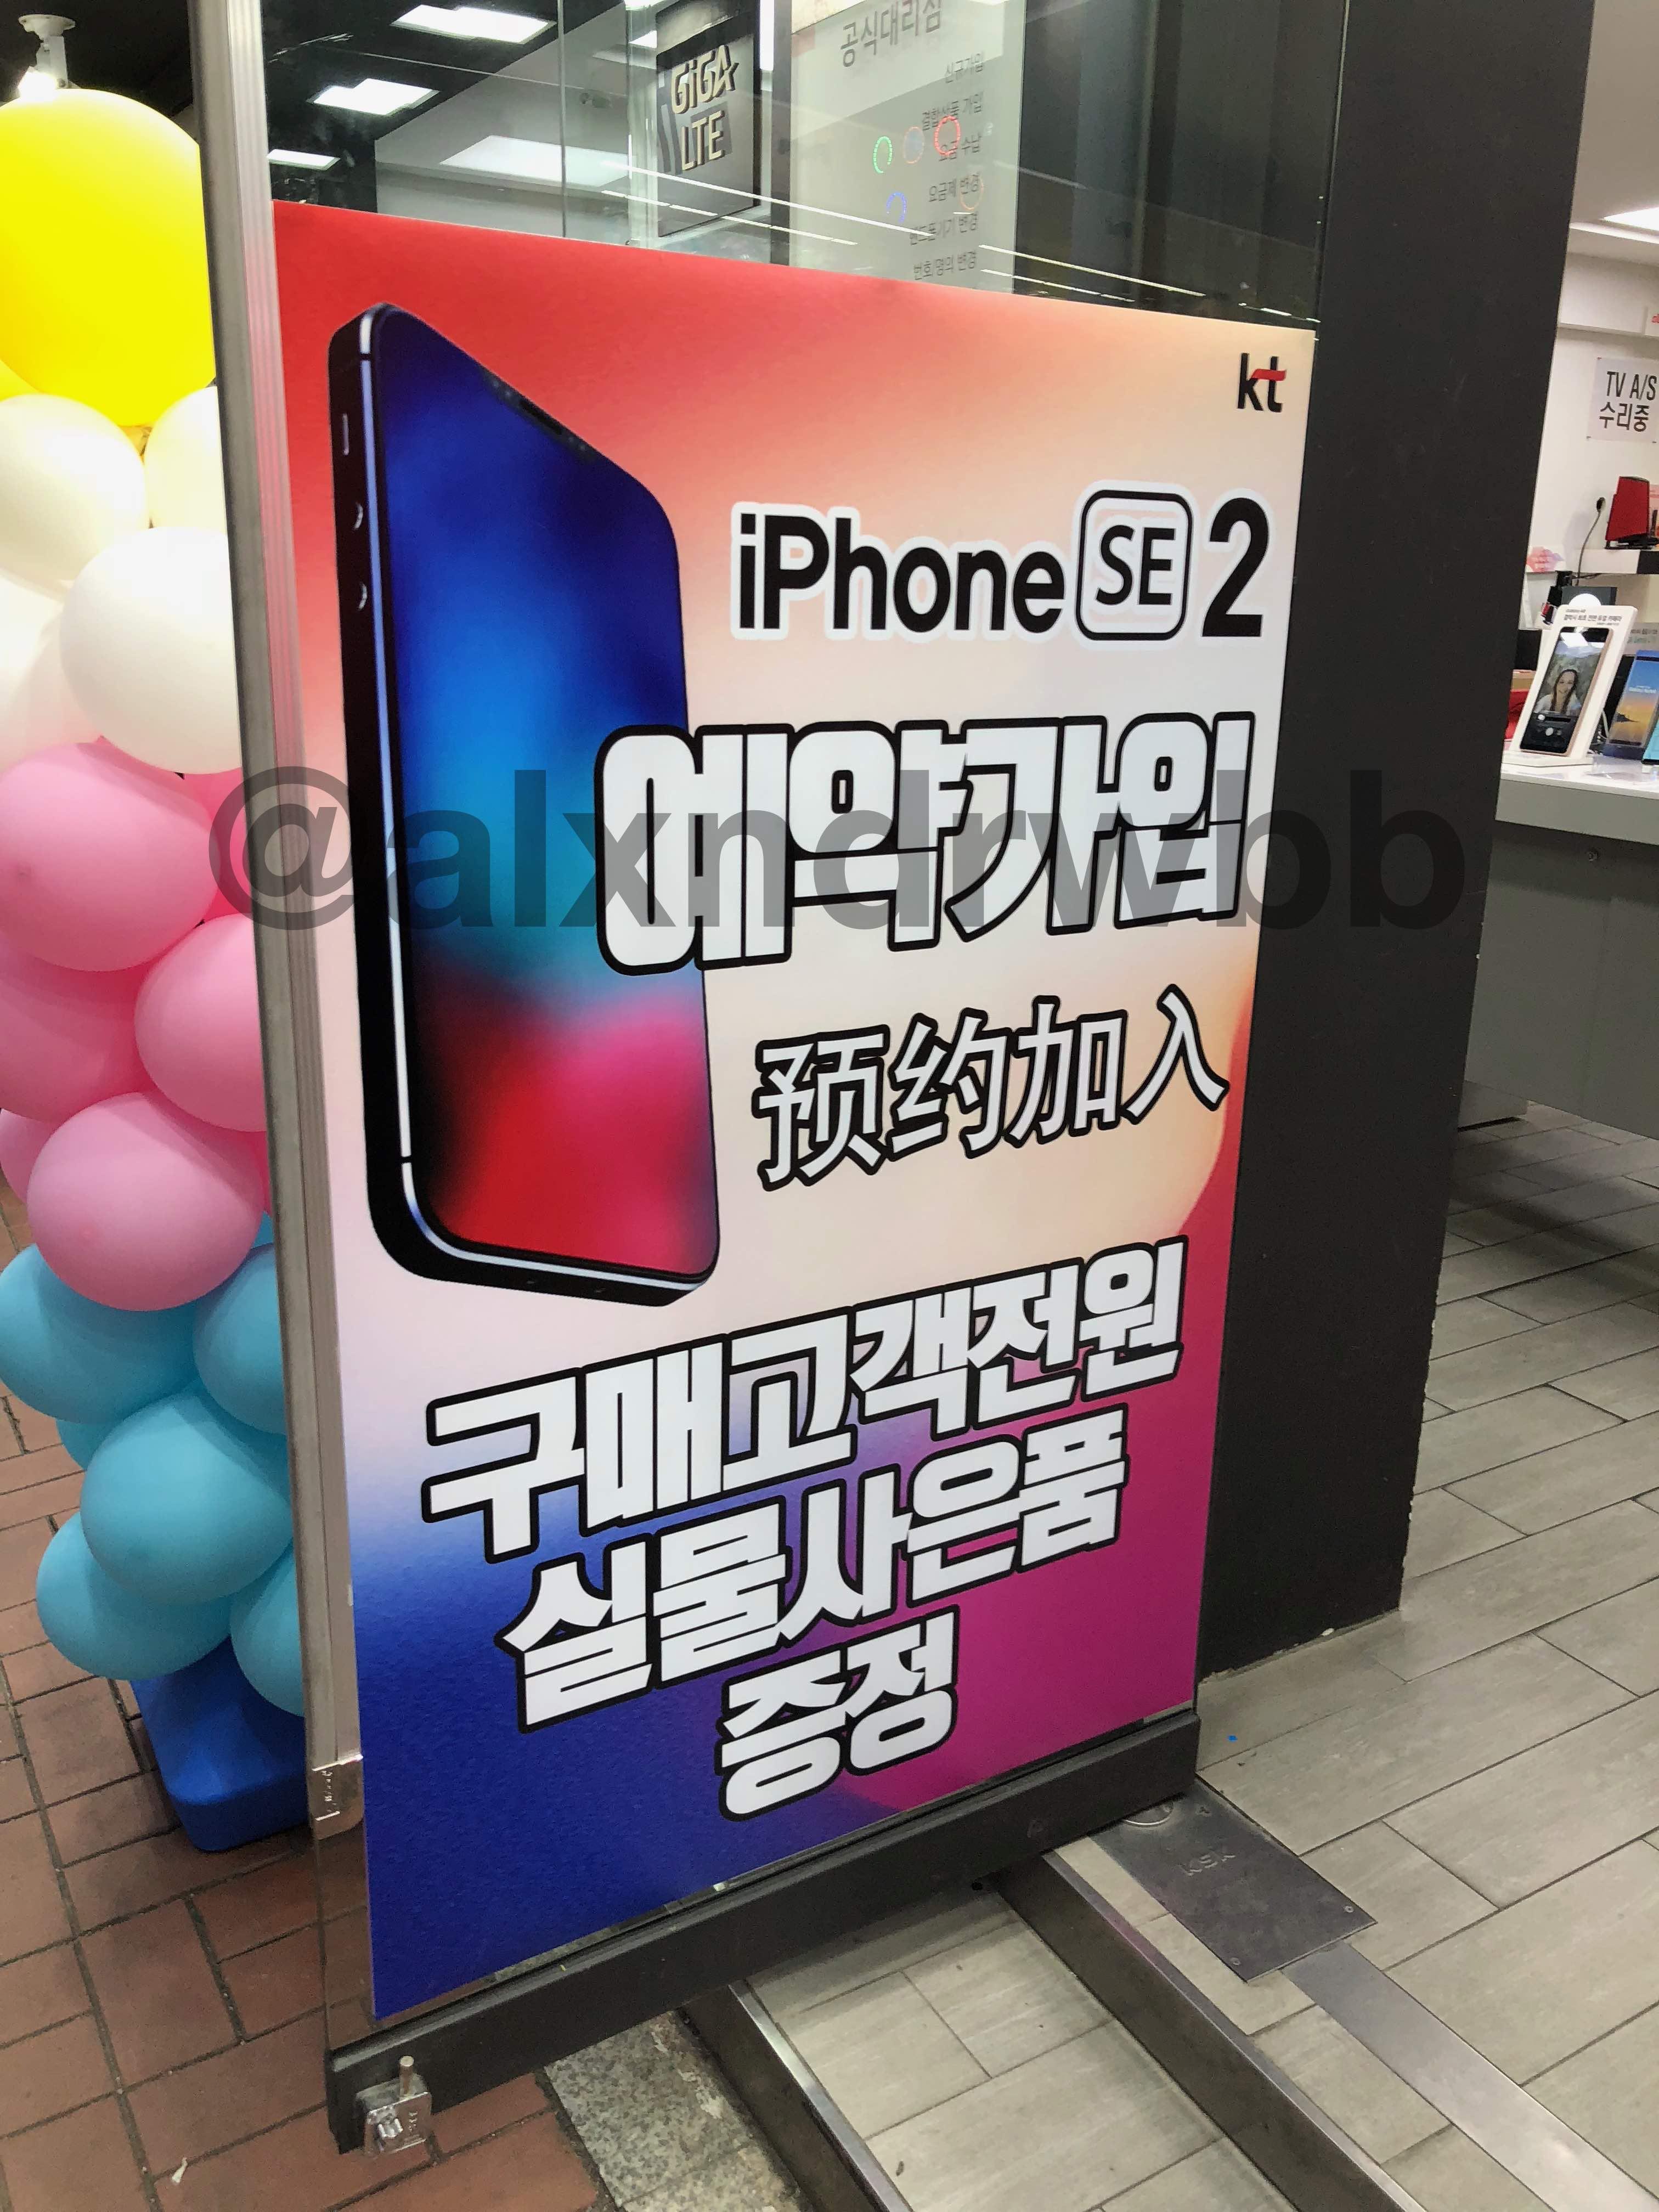 iphone se2 korea